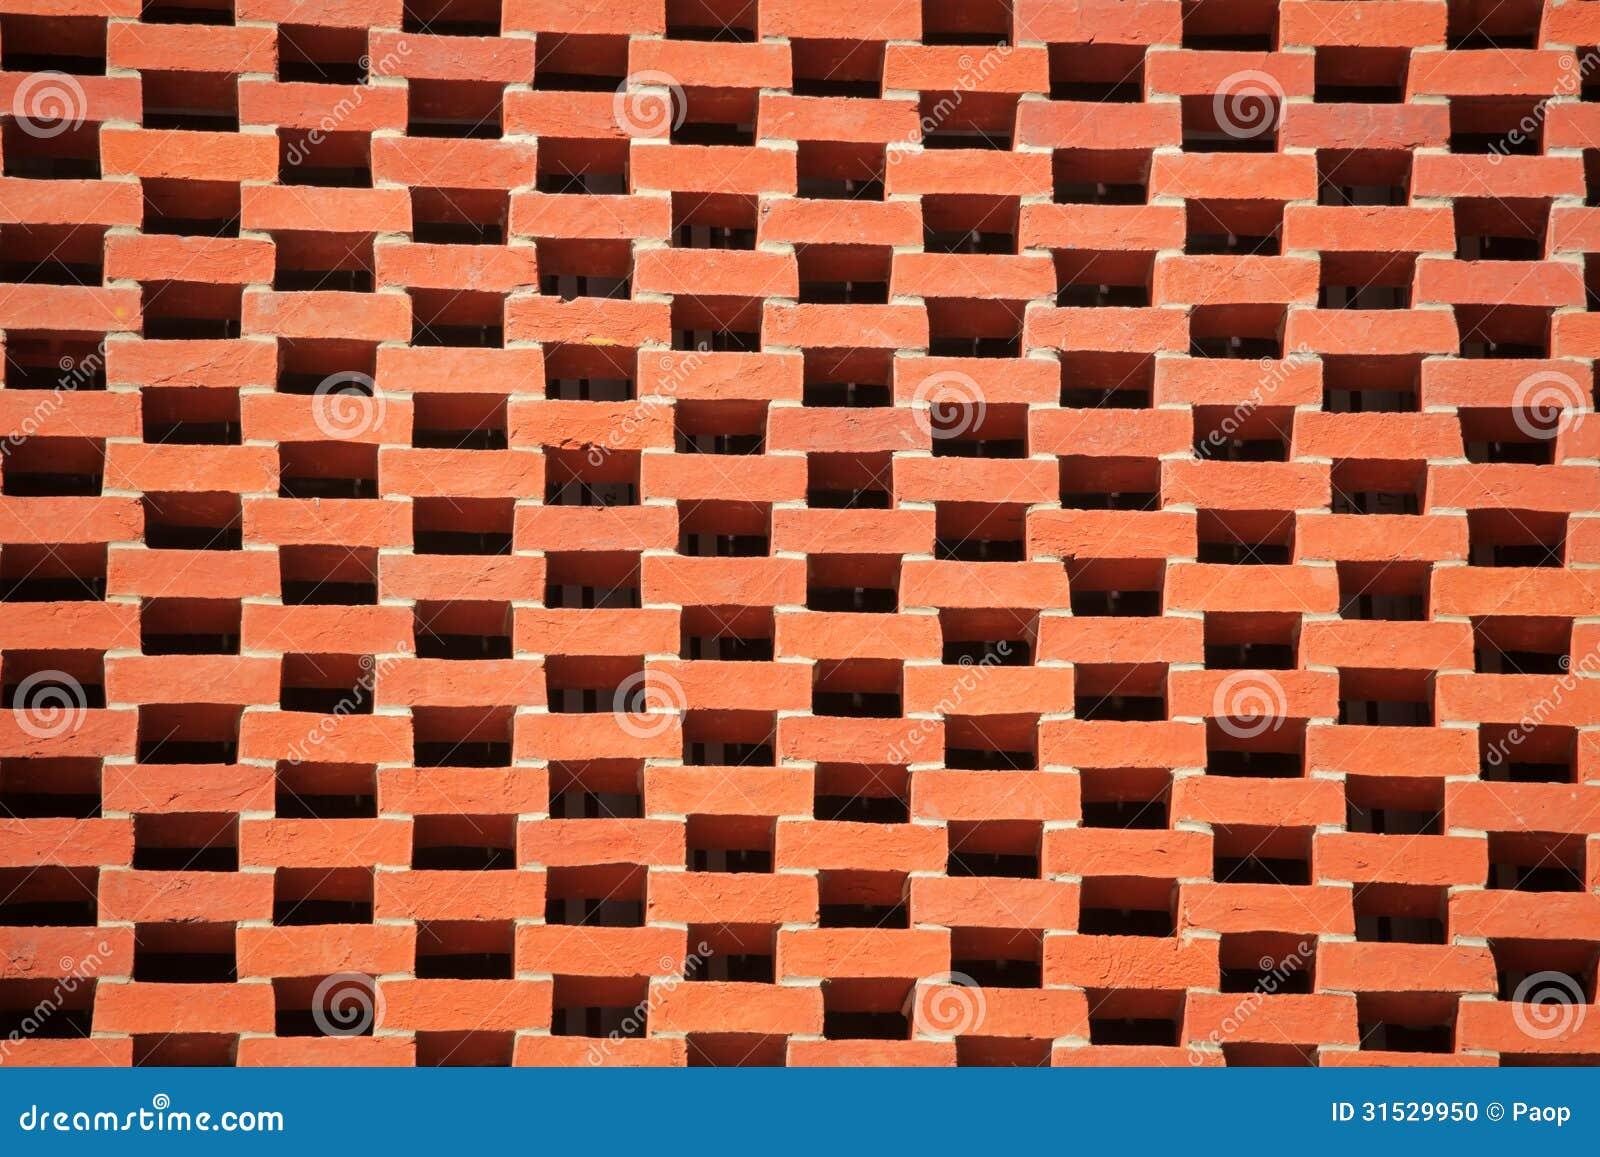 Brick Wall Pattern Stock Photo Image Of Cement Alternating